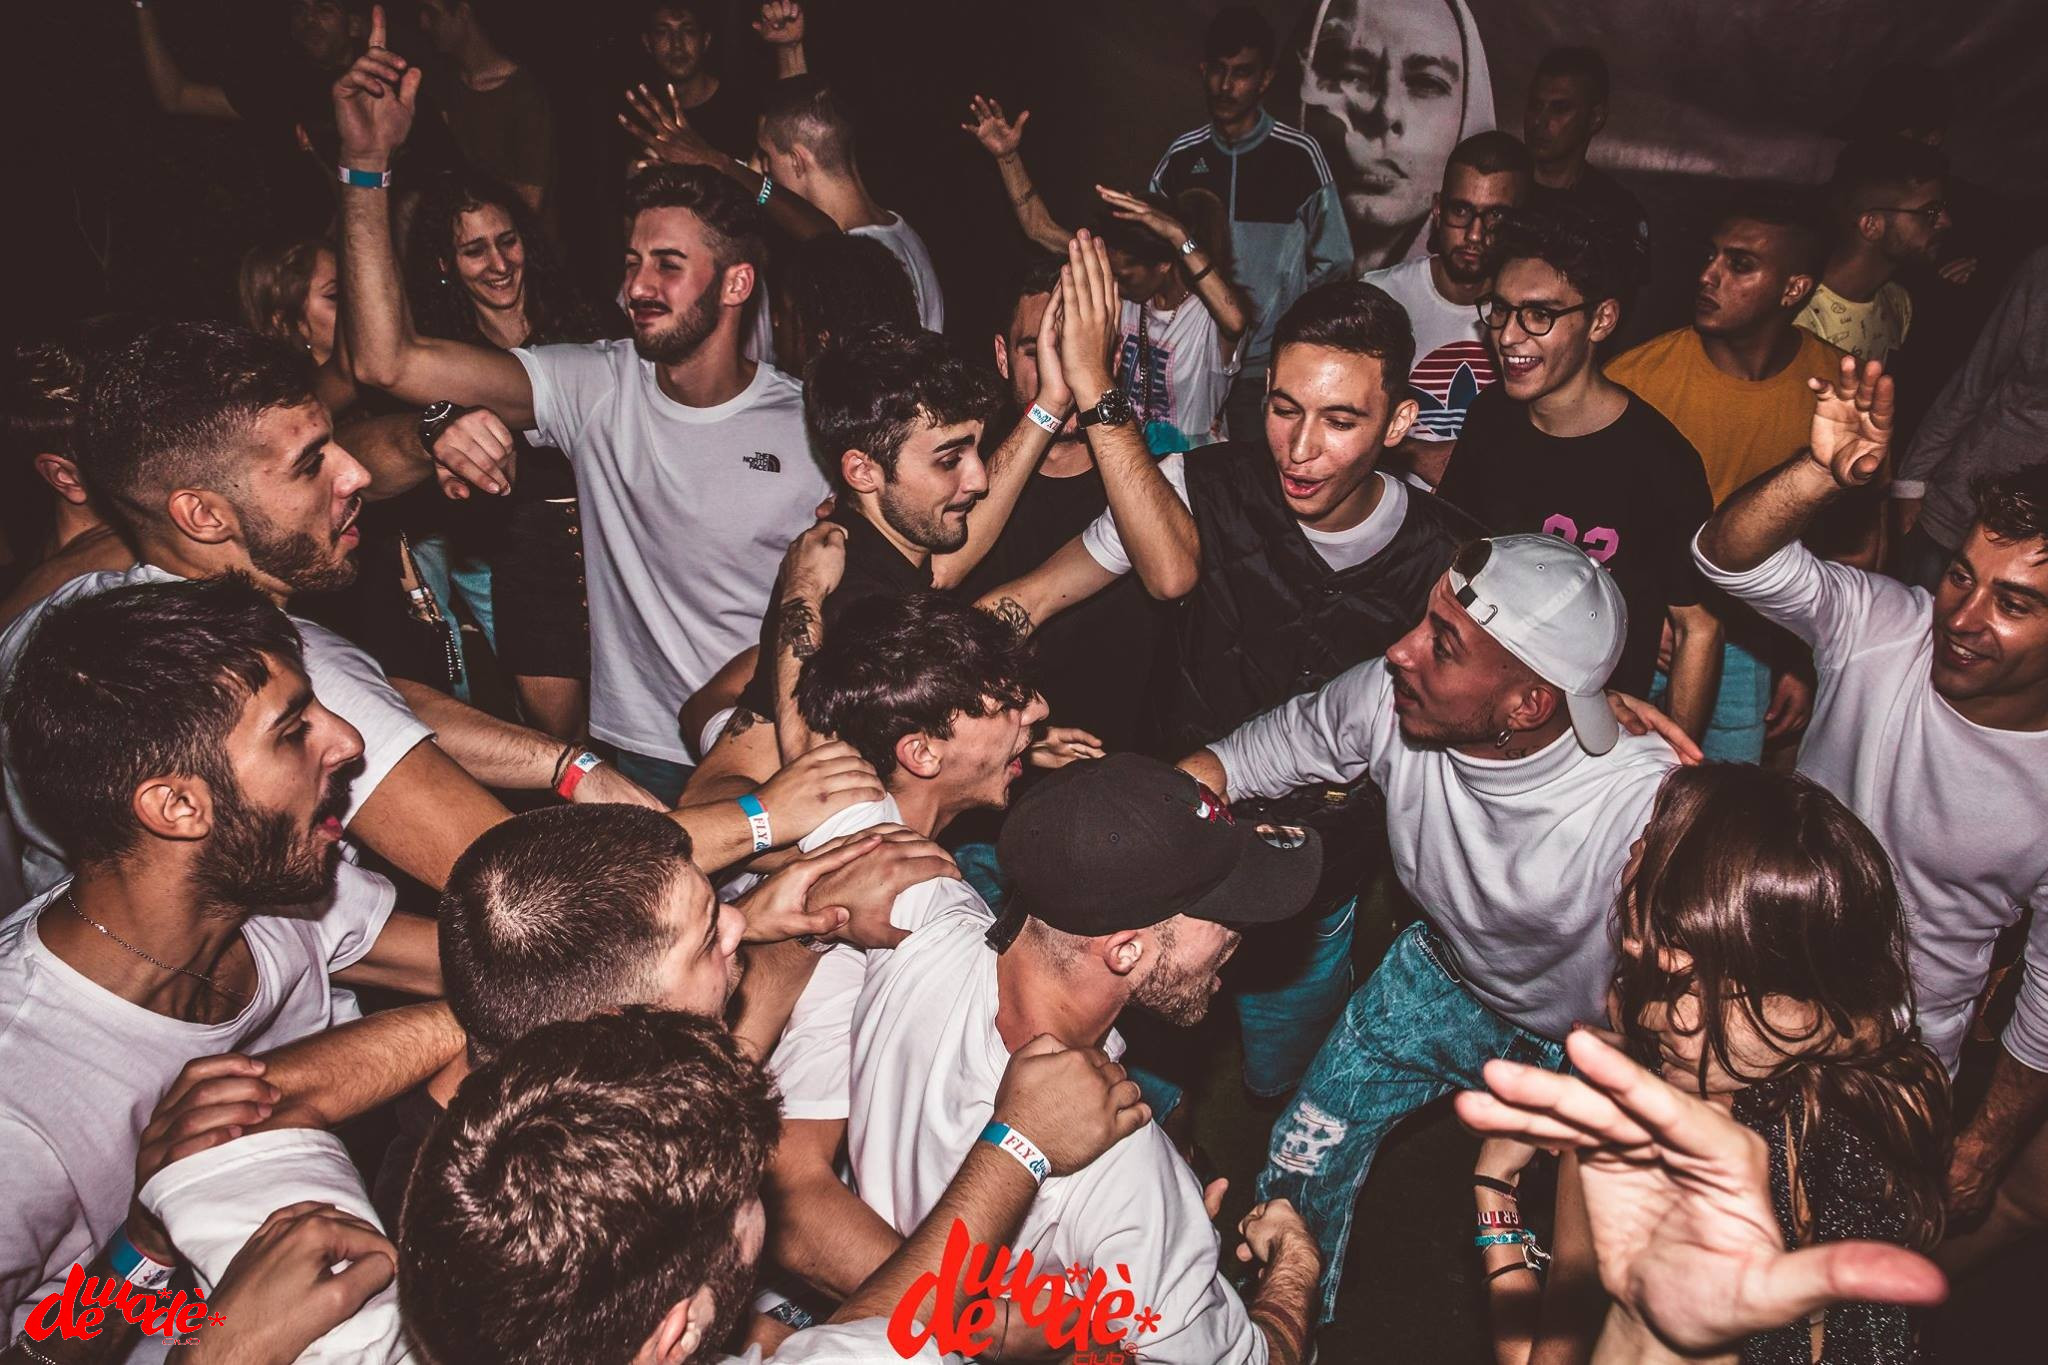 EIFFEL 65 & Red Light Circus @Demode' Club - 06/10/2018